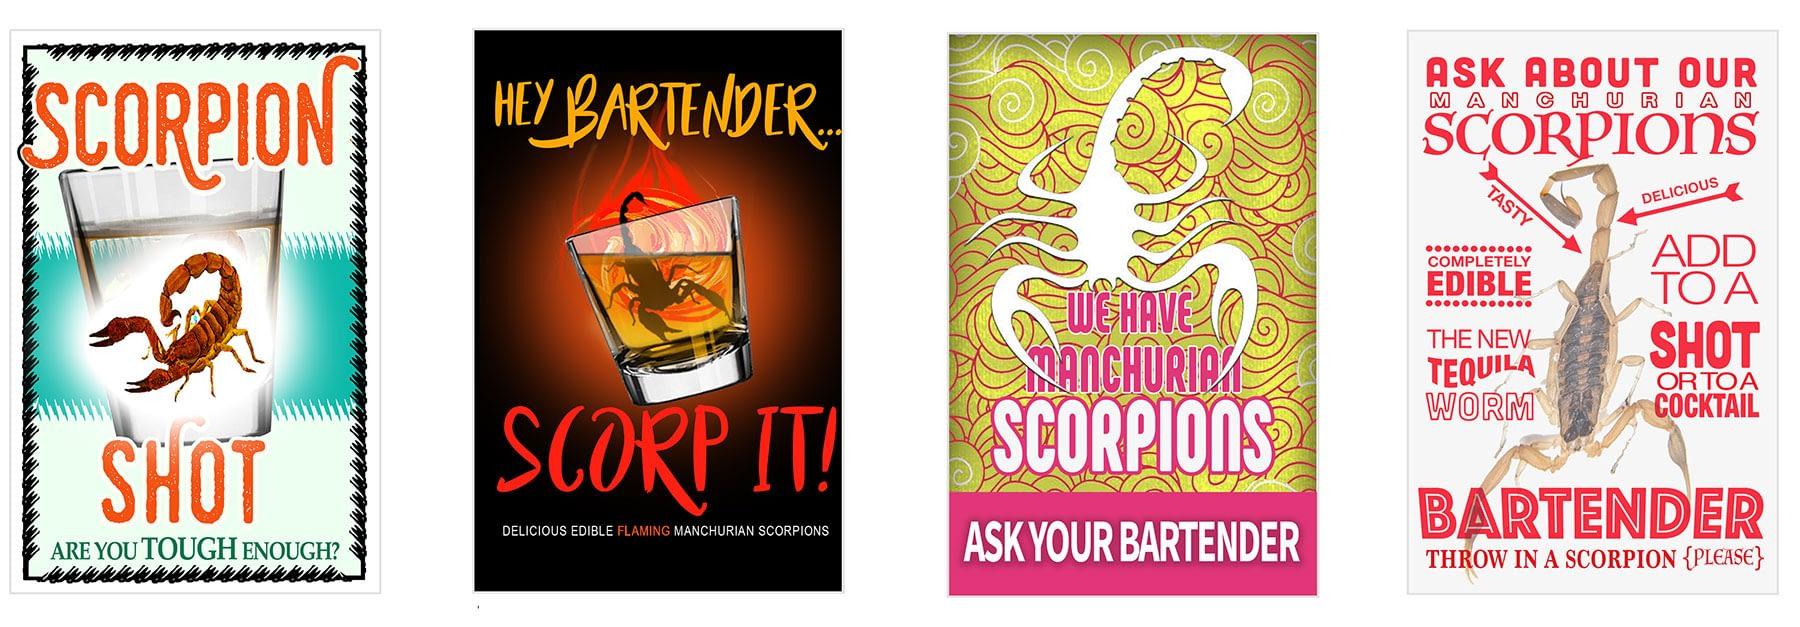 Free Scorpion Marketing Materials